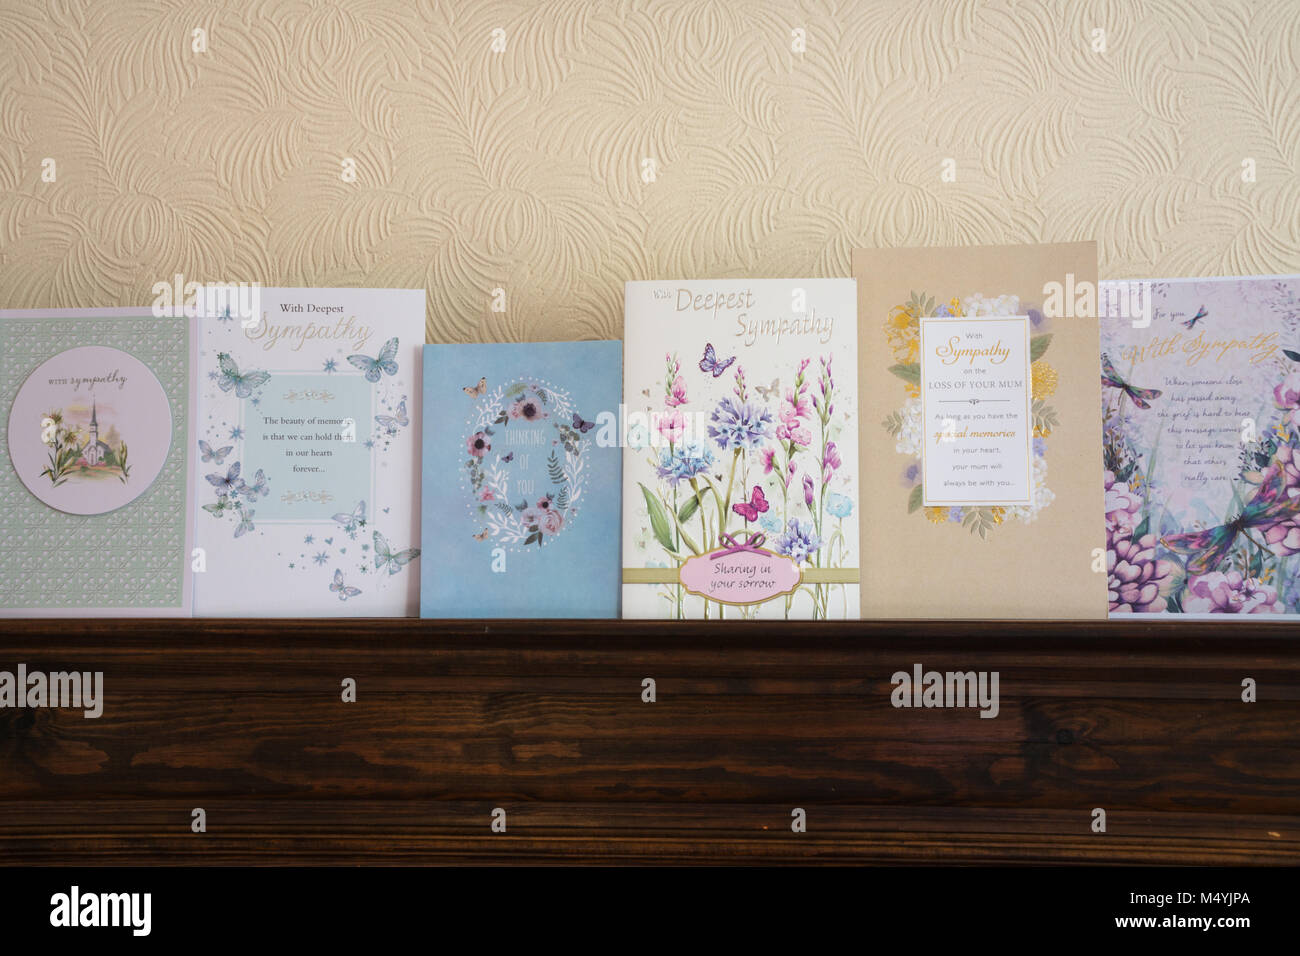 Fila de tarjetas de pésame en una repisa de chimenea Imagen De Stock